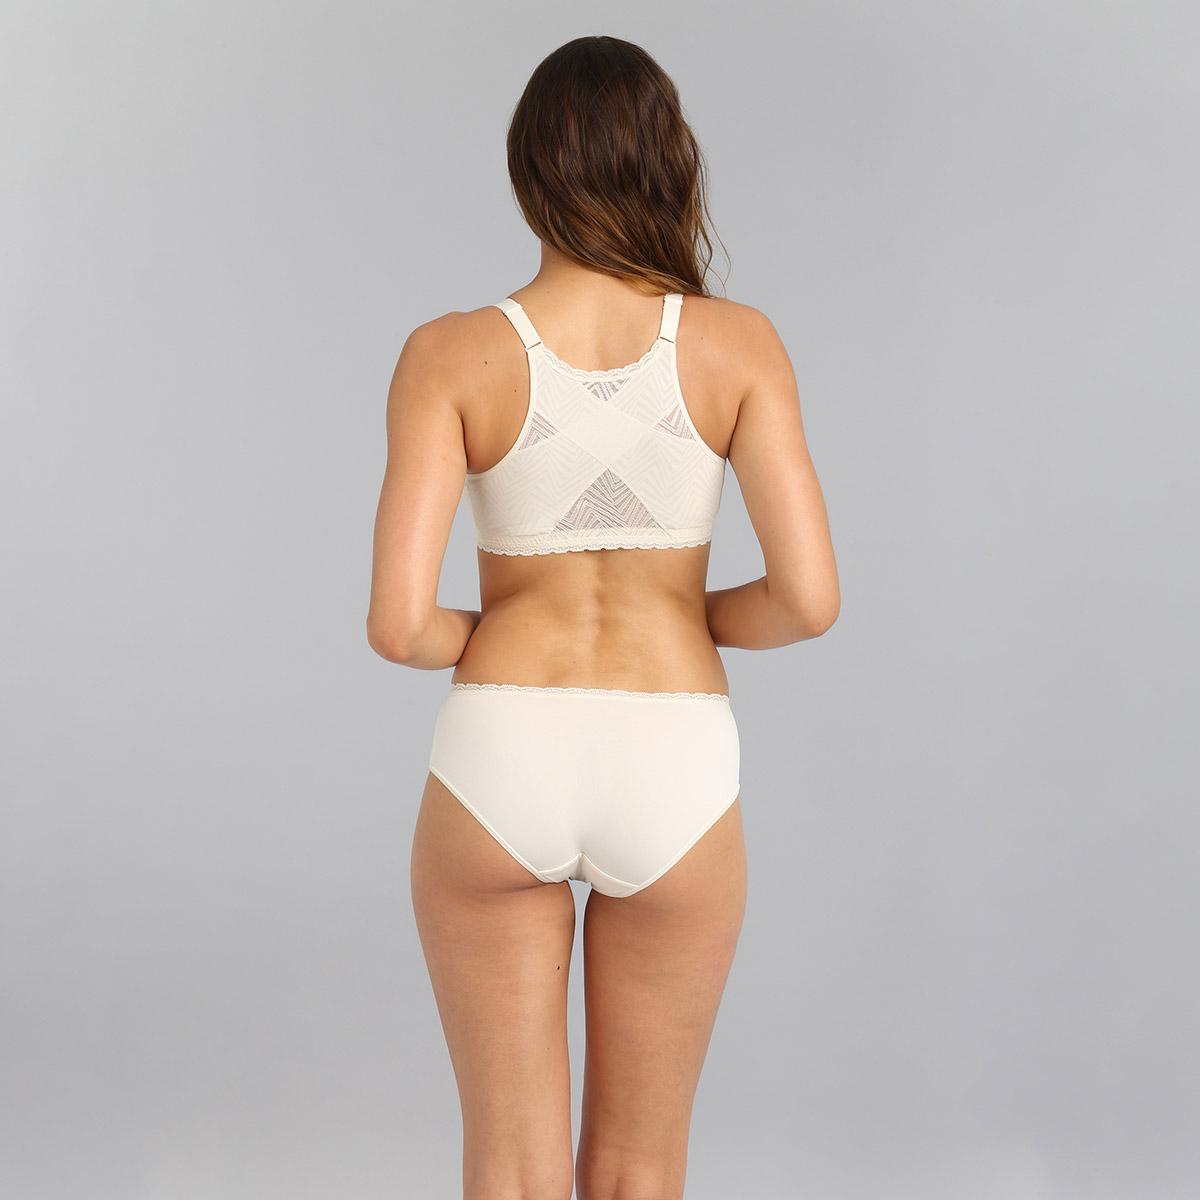 Braga midi marfil Ideal Posture, , PLAYTEX